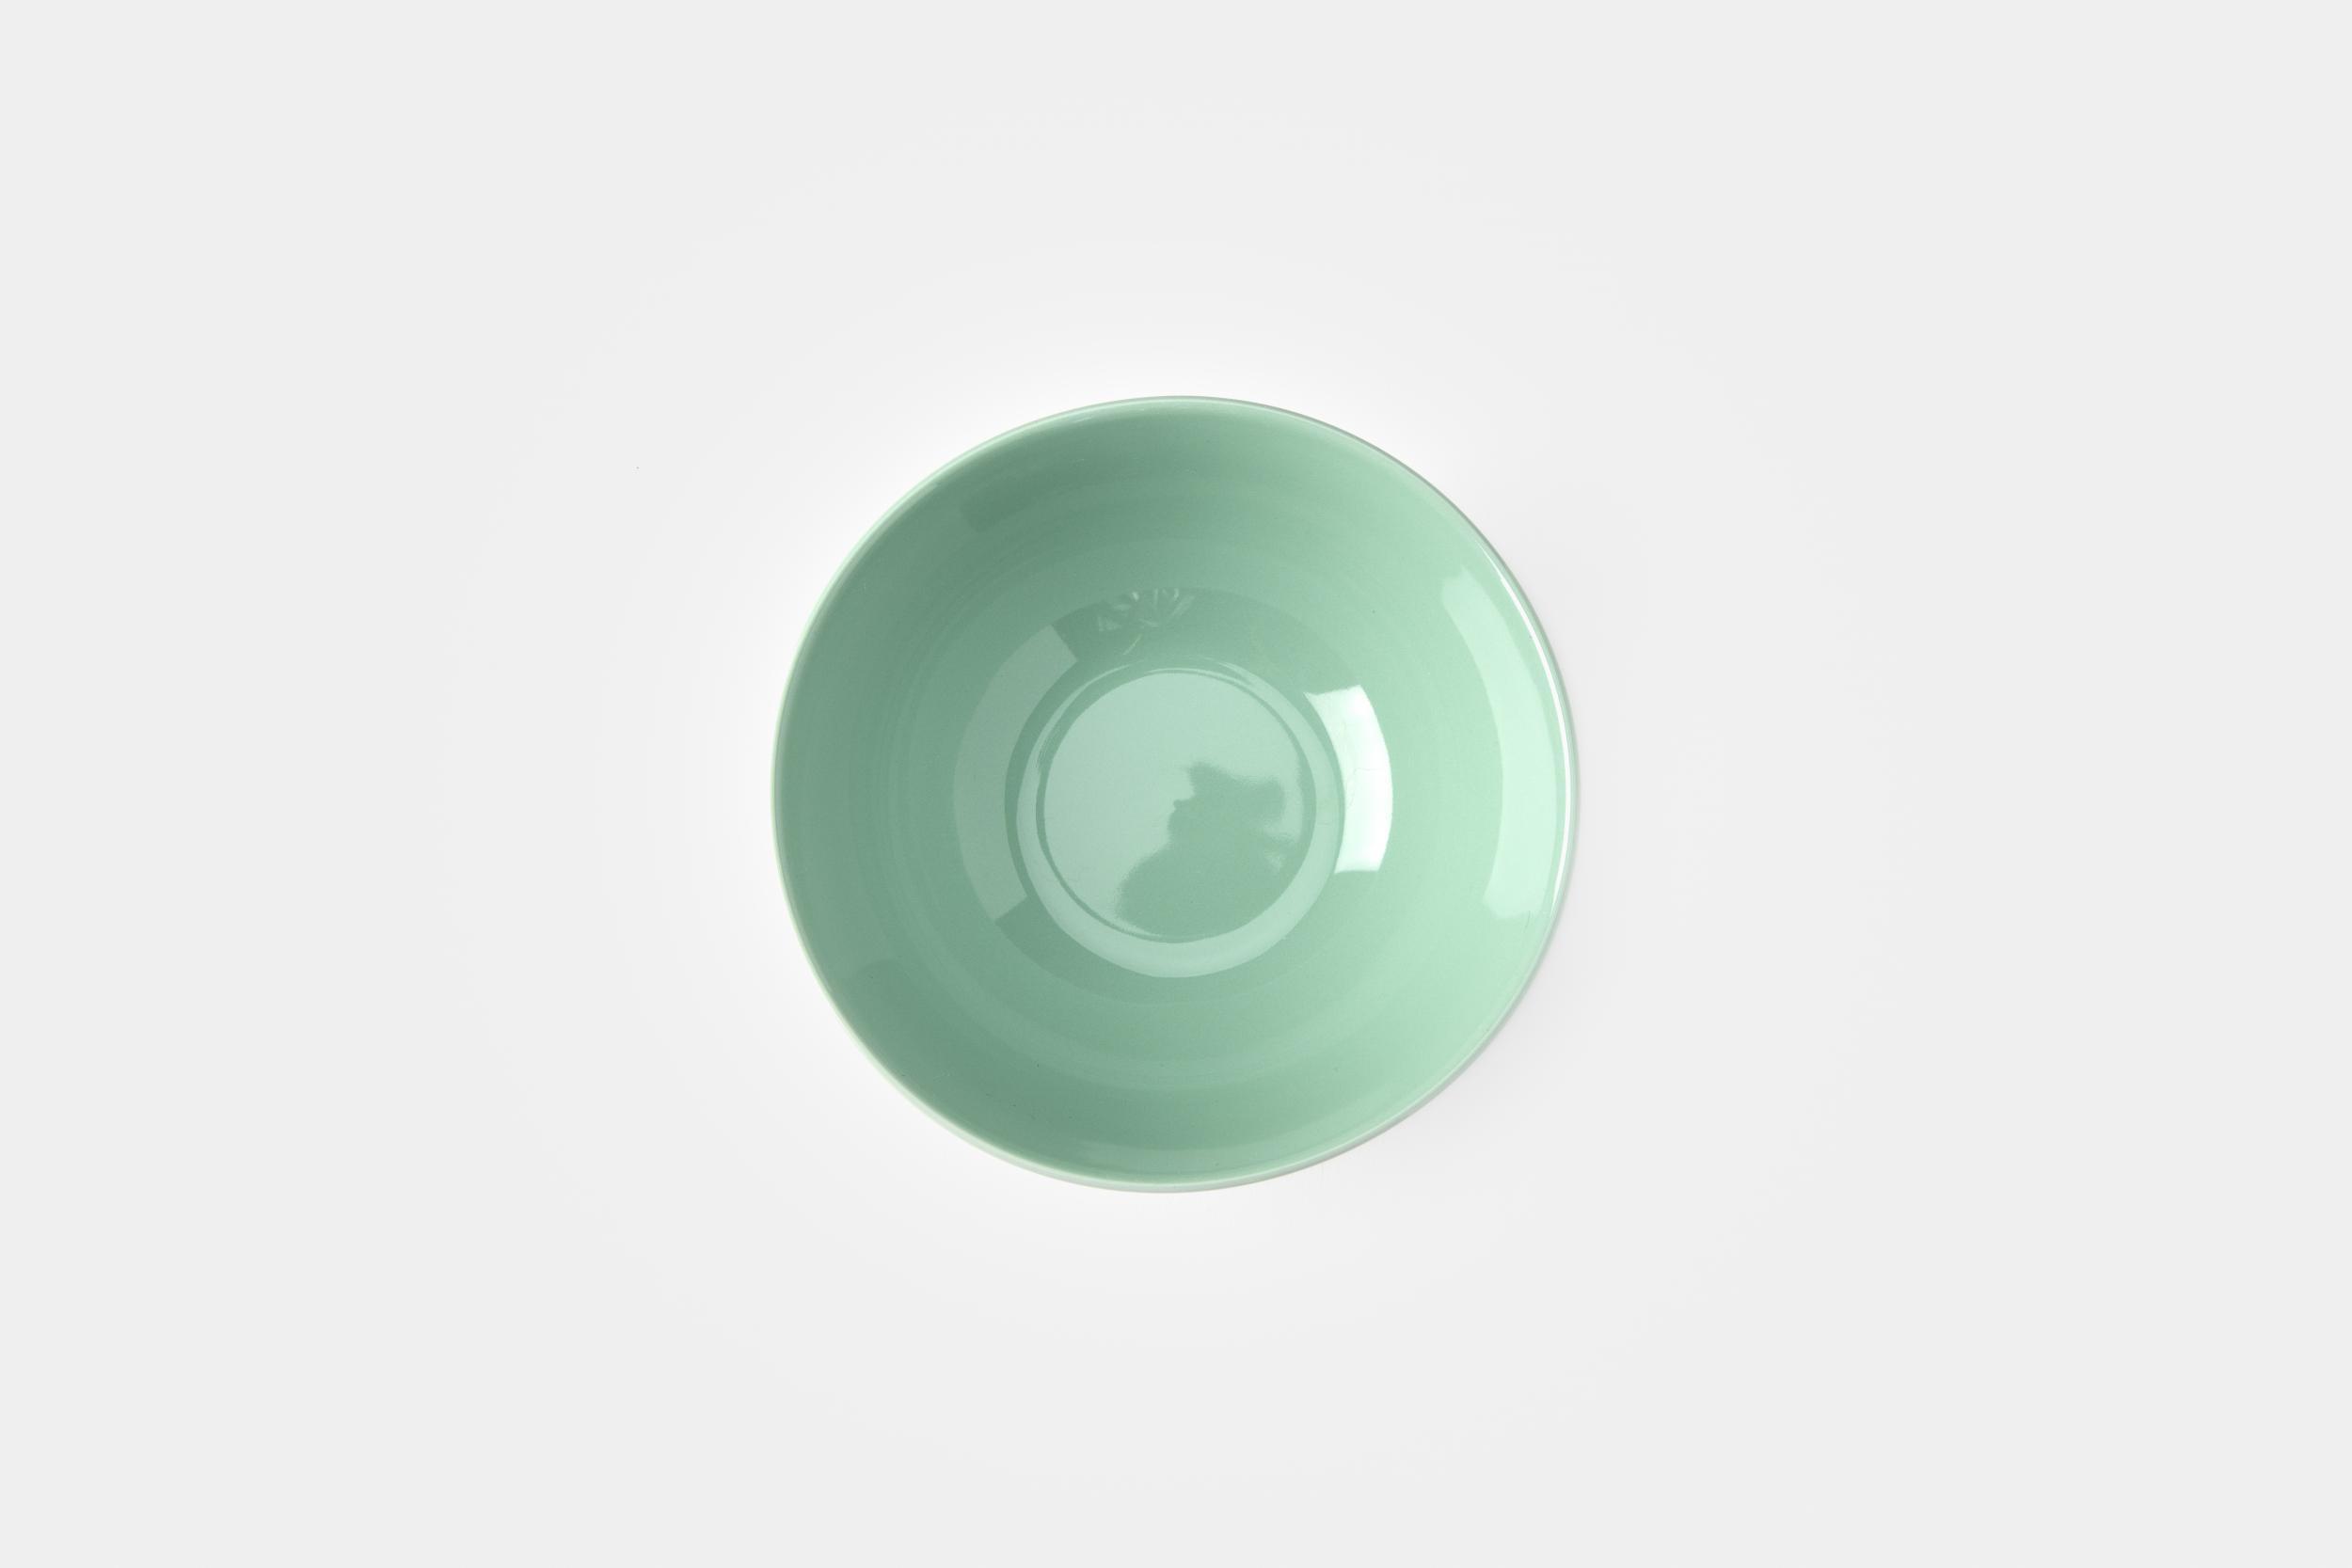 Mint green bowl - Image 0